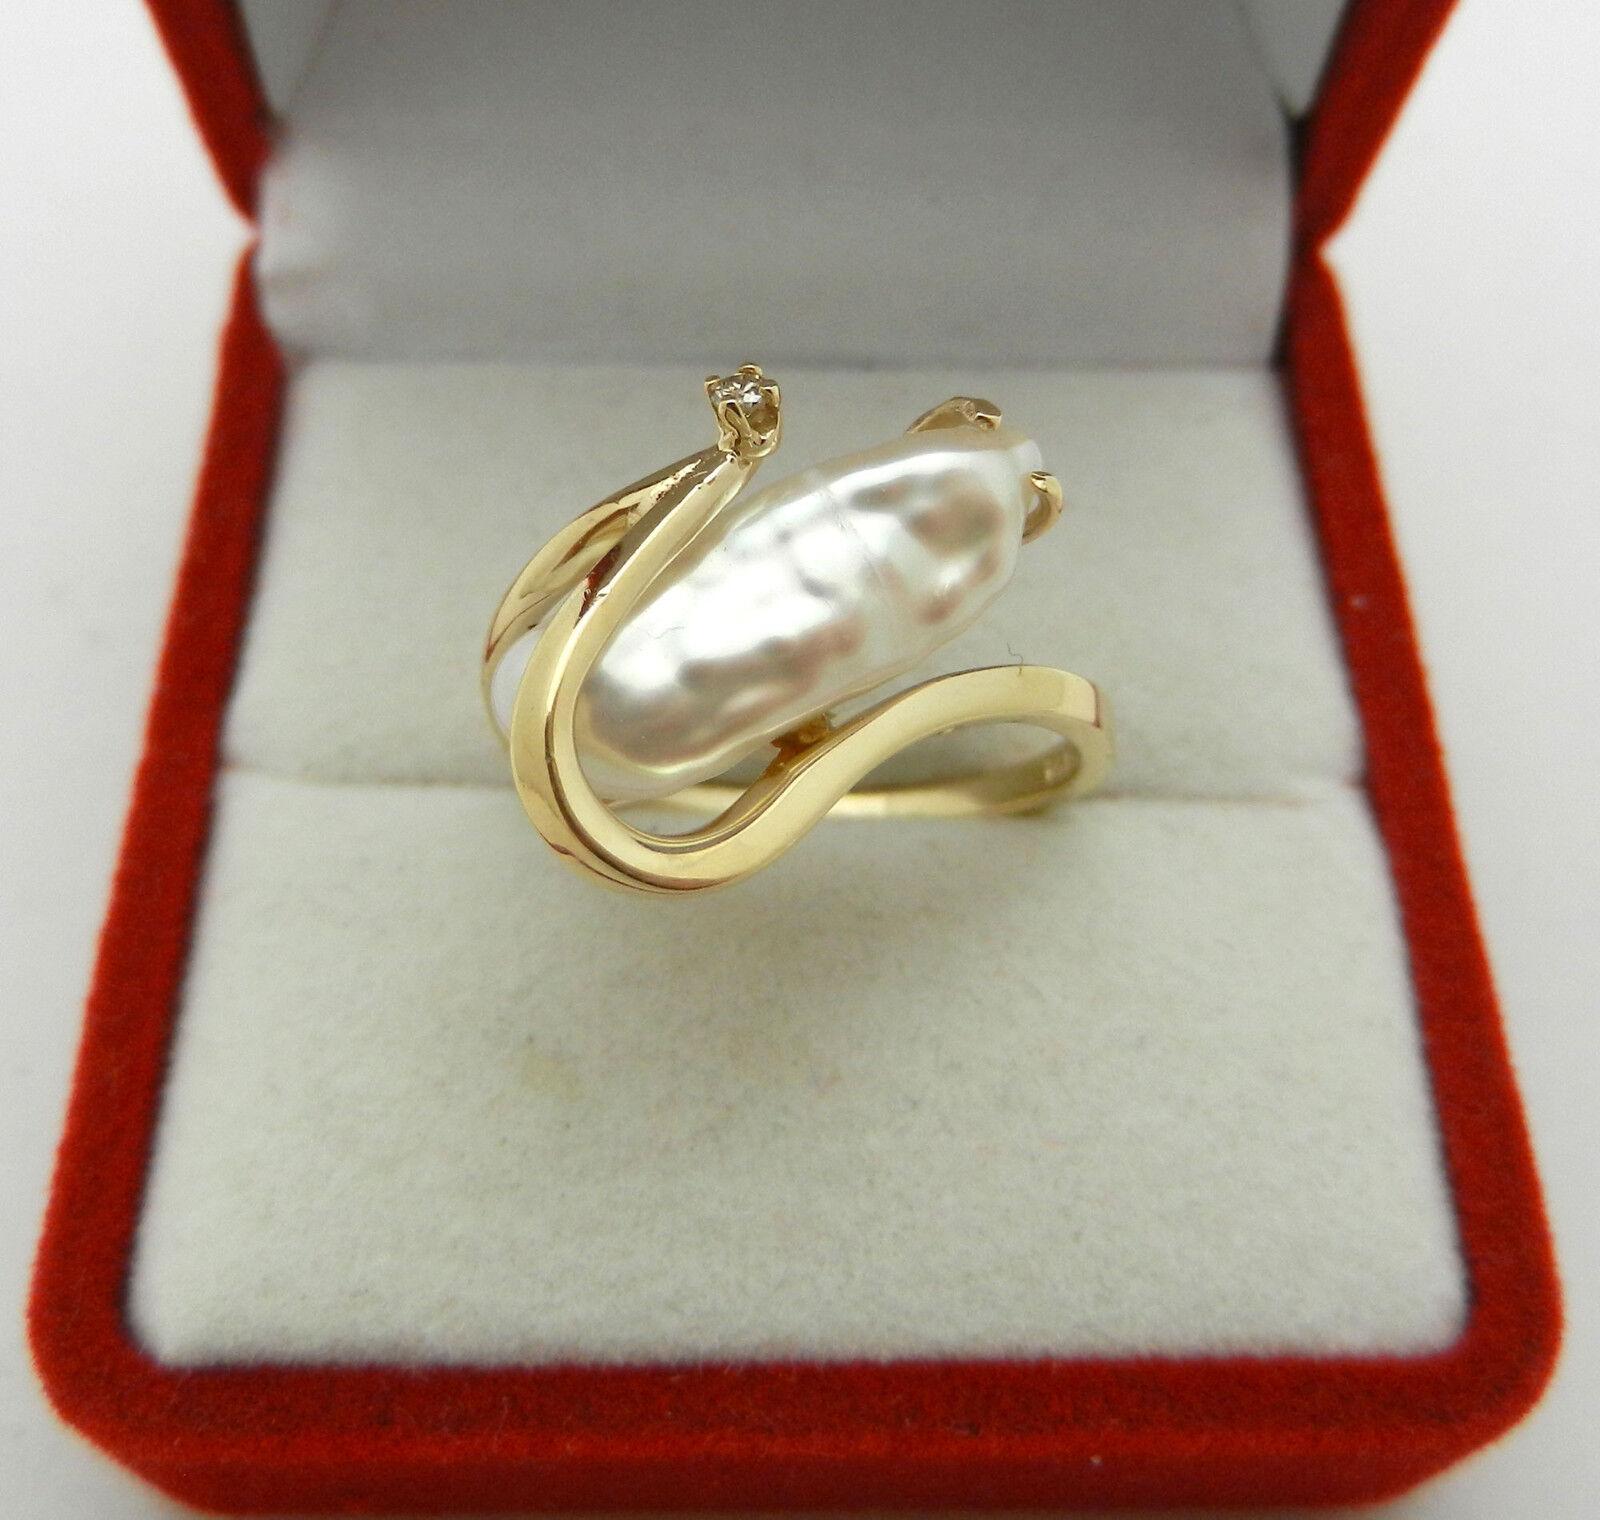 Estate 14K Yellow gold Oblong Biwa Pearl Ring Diamond Accent - Size 6